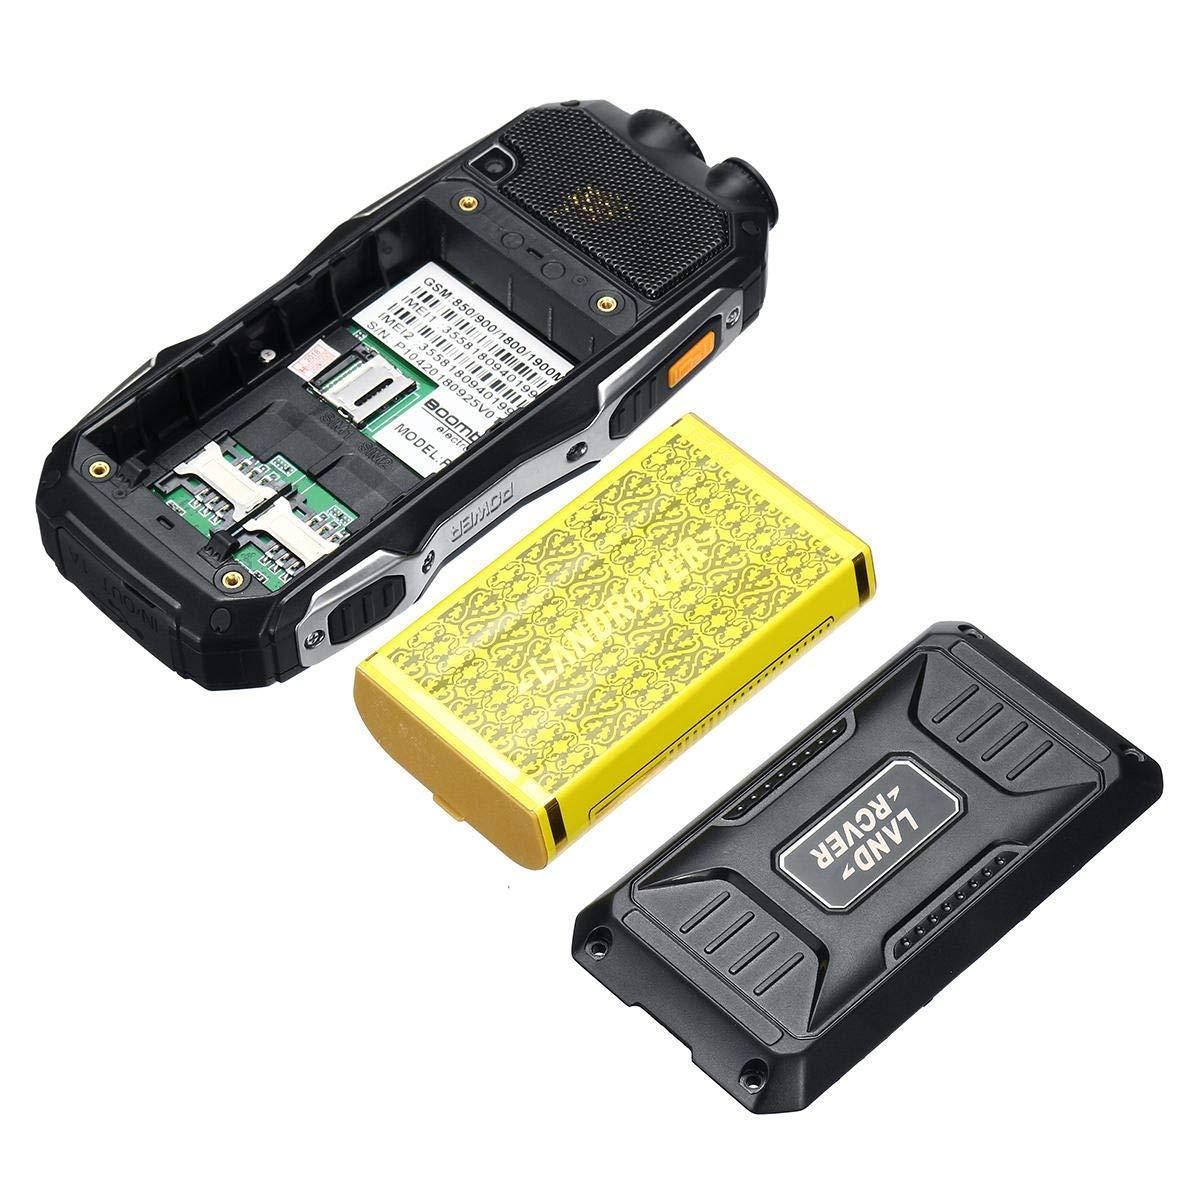 Zhanyiyi Antena walkie-Talkie 2.4inch 19800mah Resistente Dual SIM ...